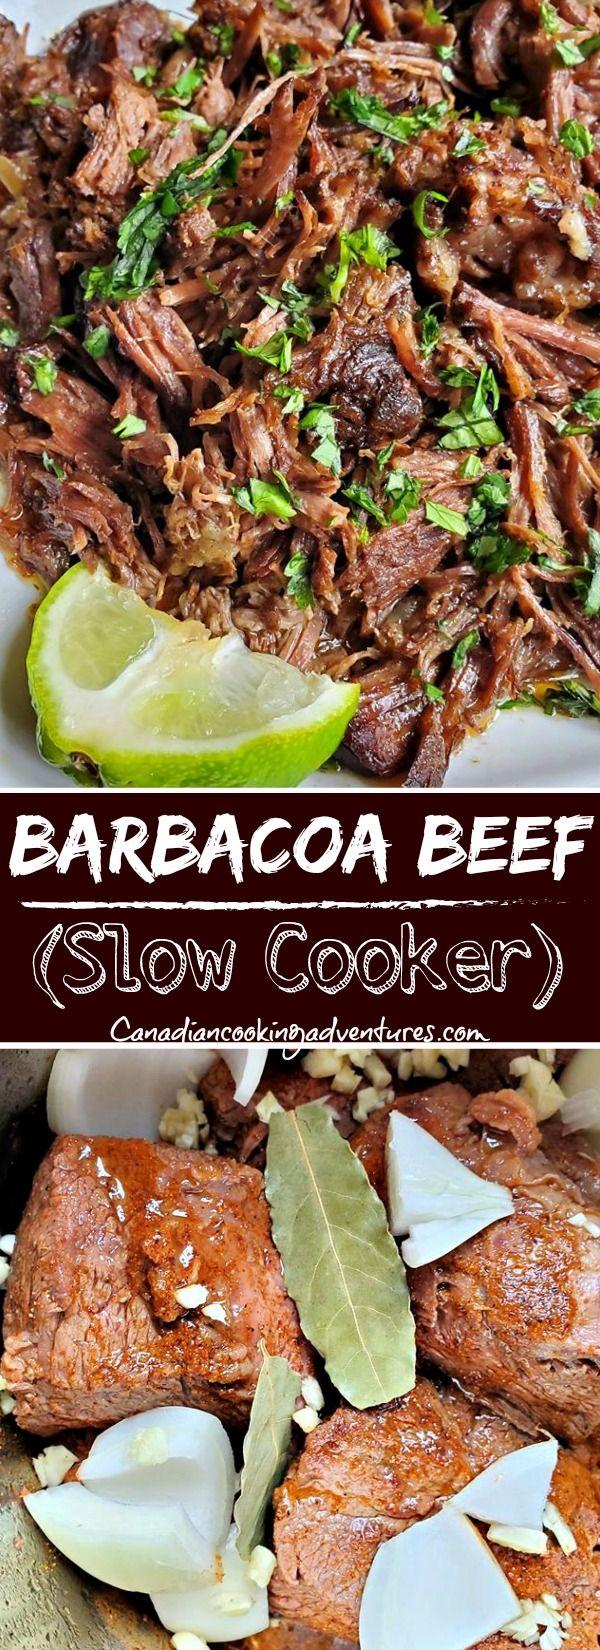 Barbacoa Beef Recipe (Slow Cooker)